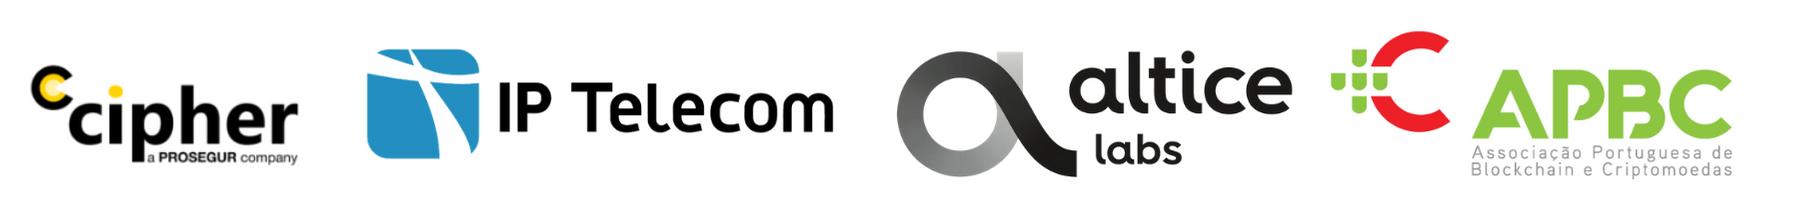 Logos -cipher ok